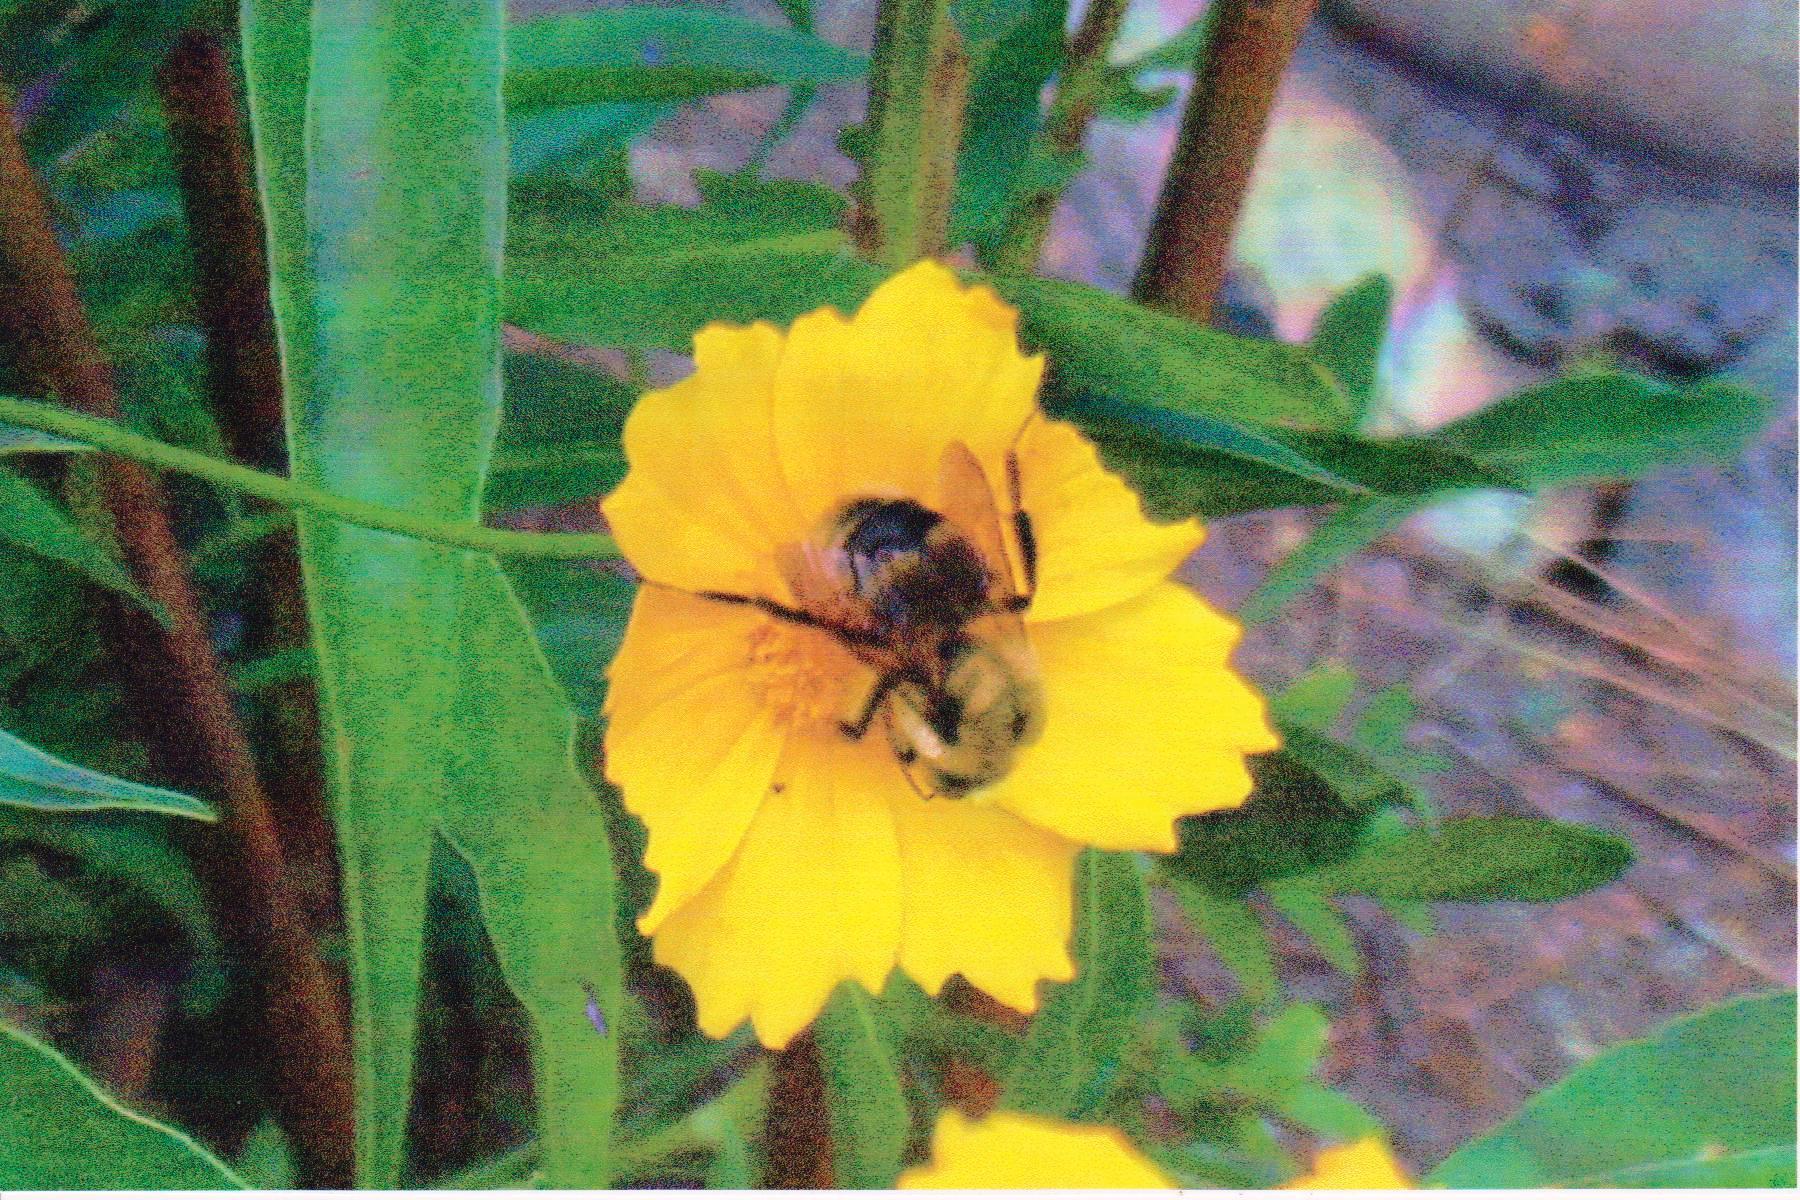 Bee on Flower on walk 2009.jpg